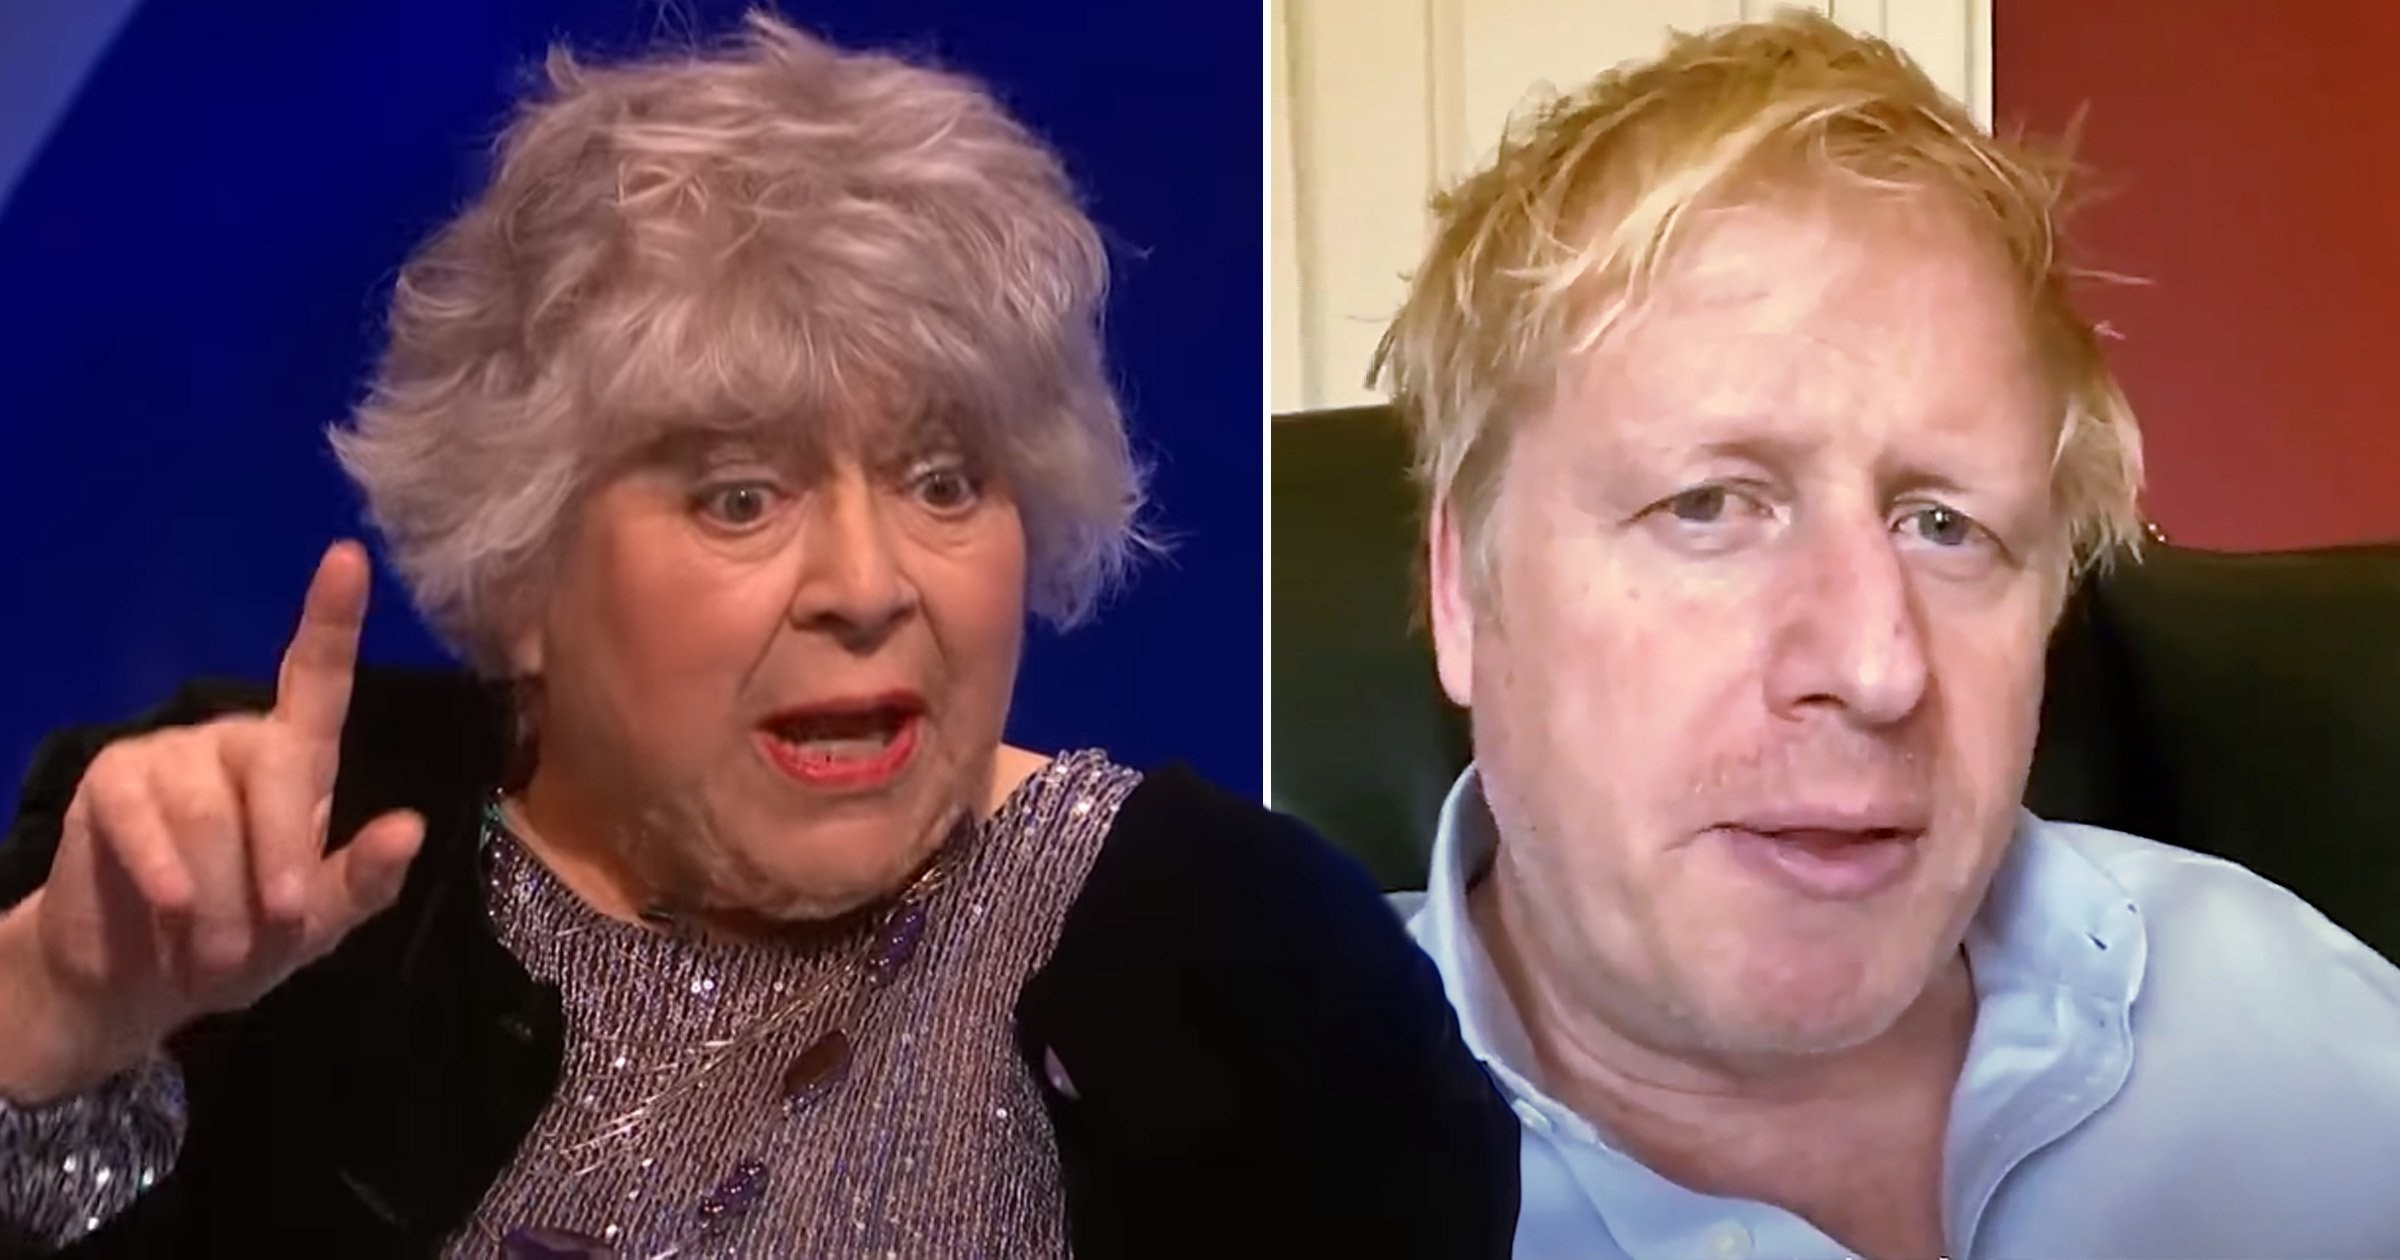 Miriam Margolyes avoids Ofcom investigation after wishing Boris Johnson dead despite downpour of backlash